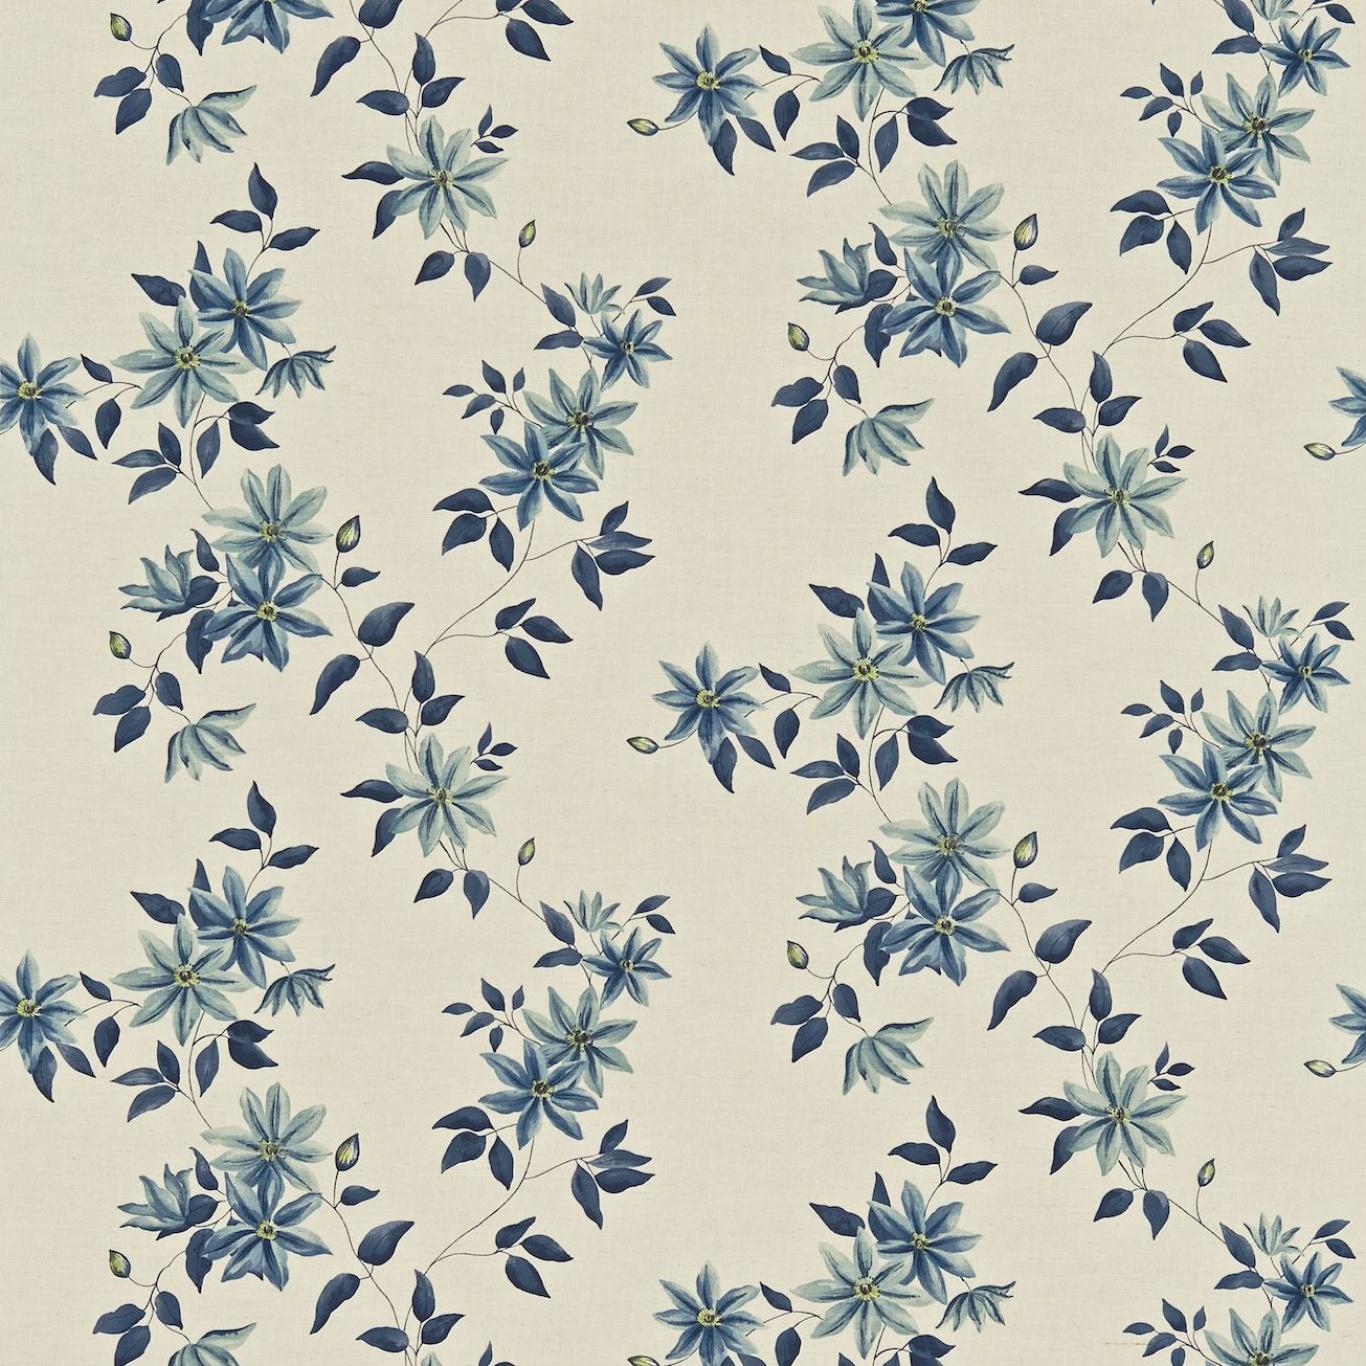 Sanderson Wisley Indigo Linen Curtain Fabric